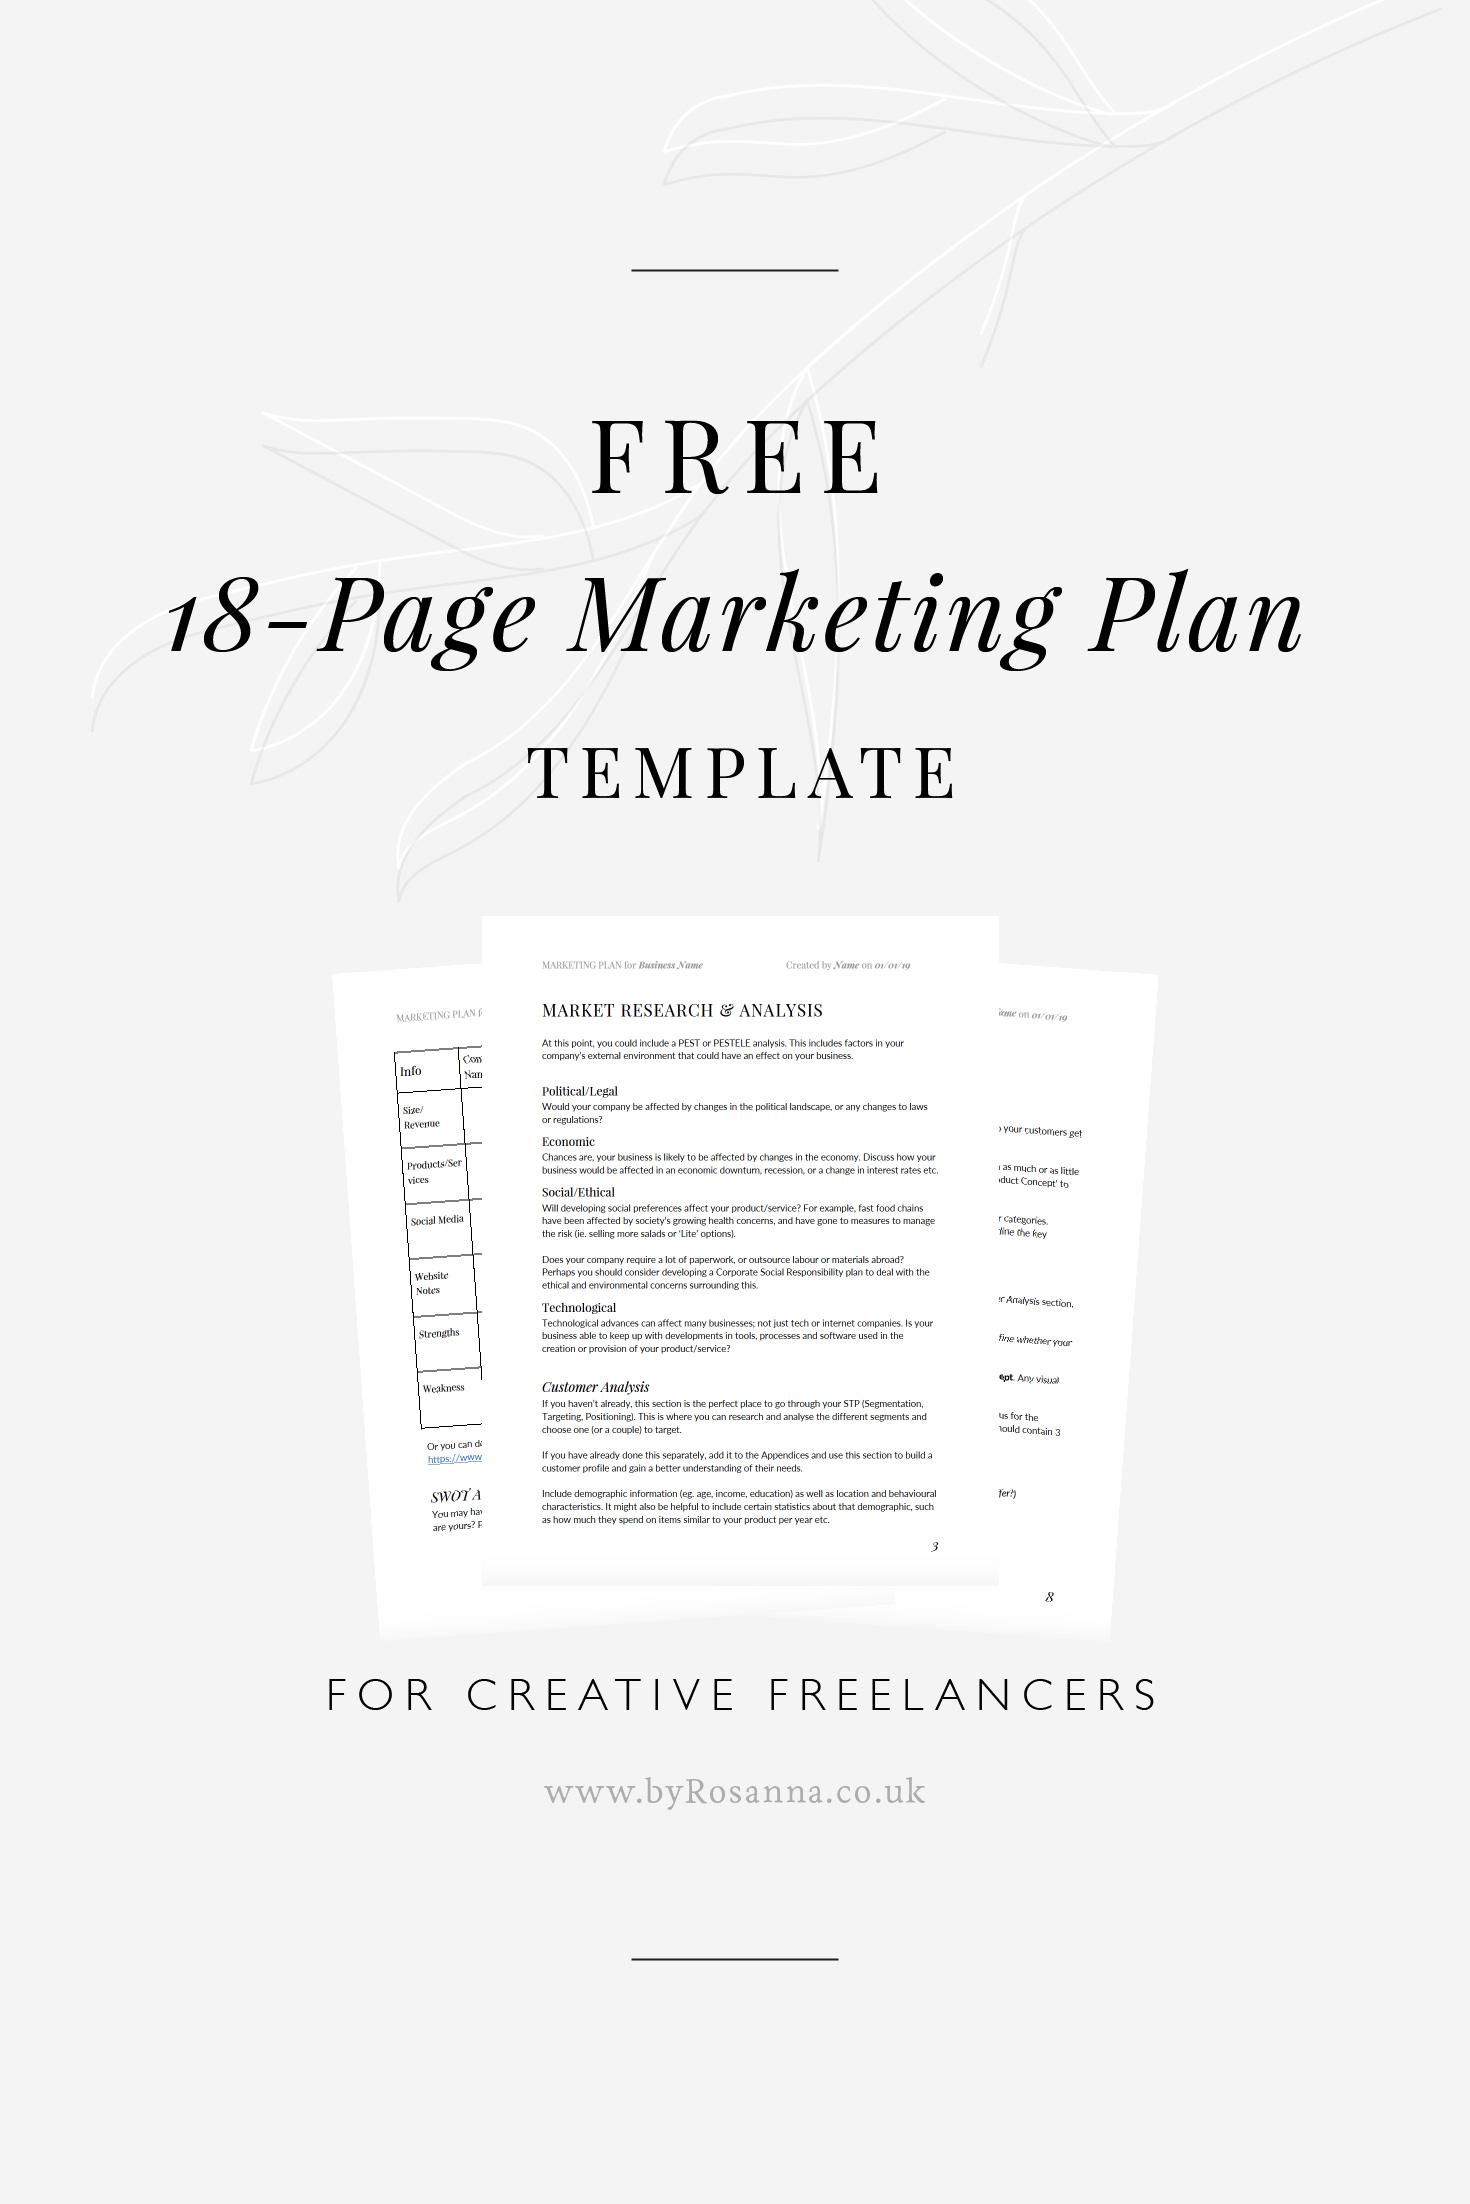 Get A Free Marketing Plan Template Byrosanna Squarespace Website Design Branding Uk